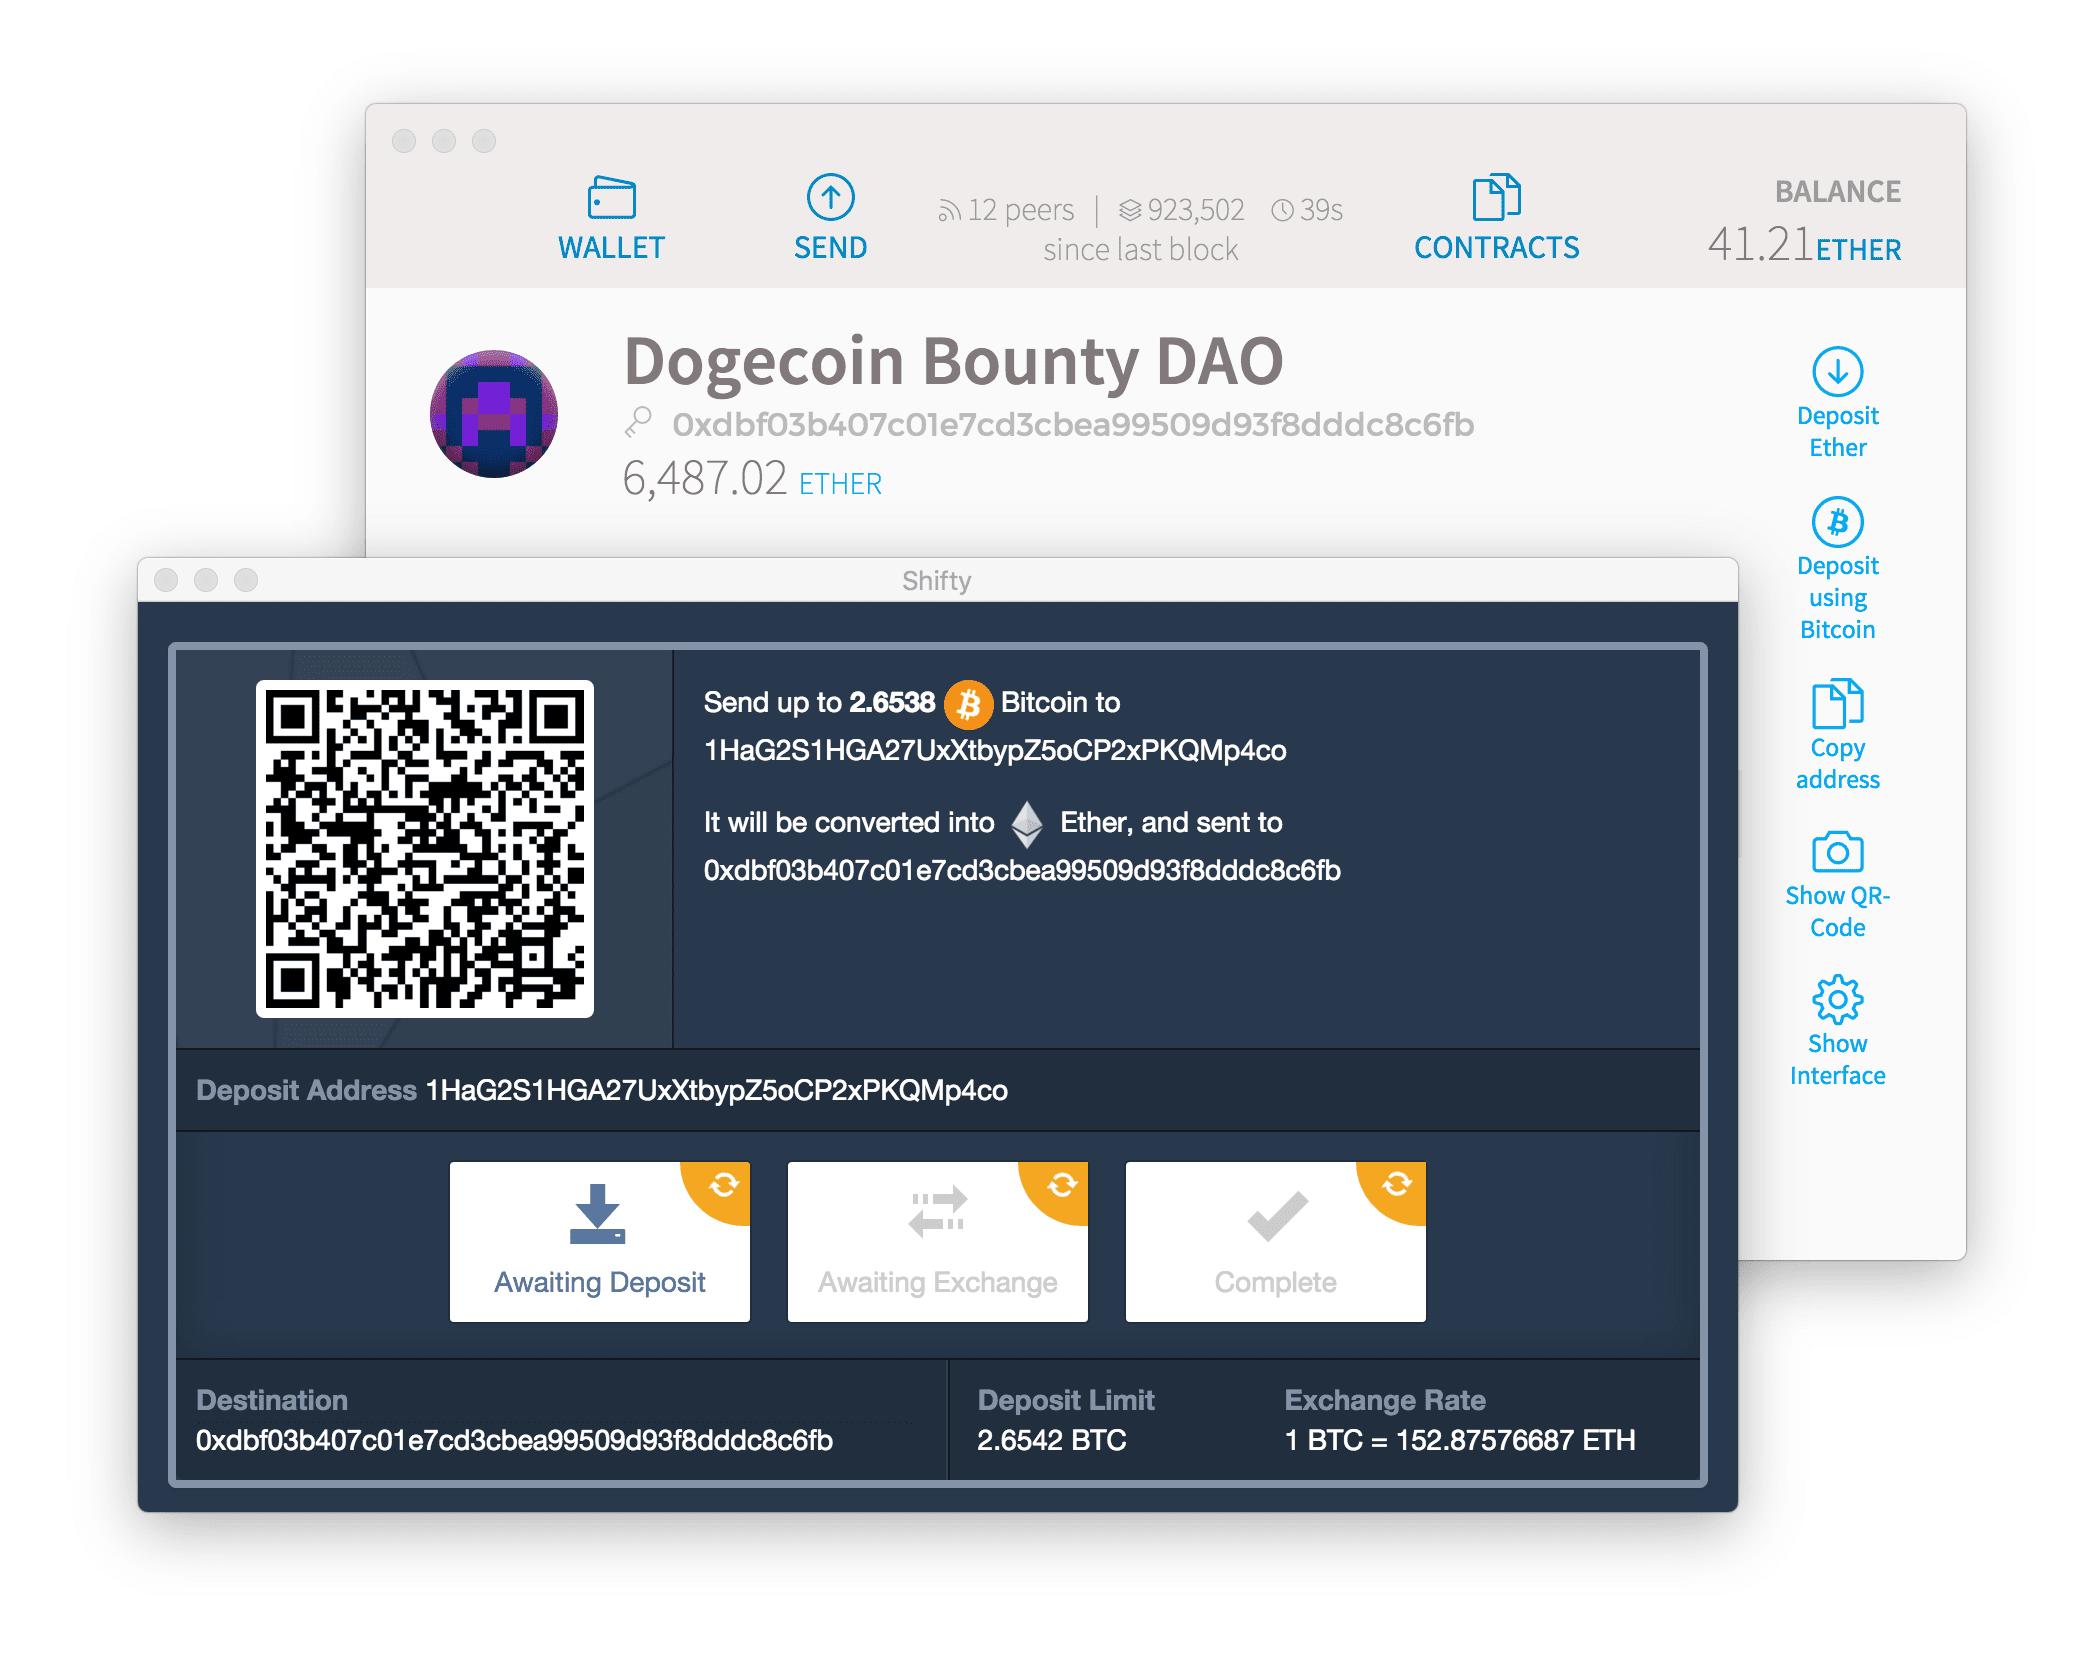 Get Free Bitcoin Wallet Best Platform To Trade Bitcoin -